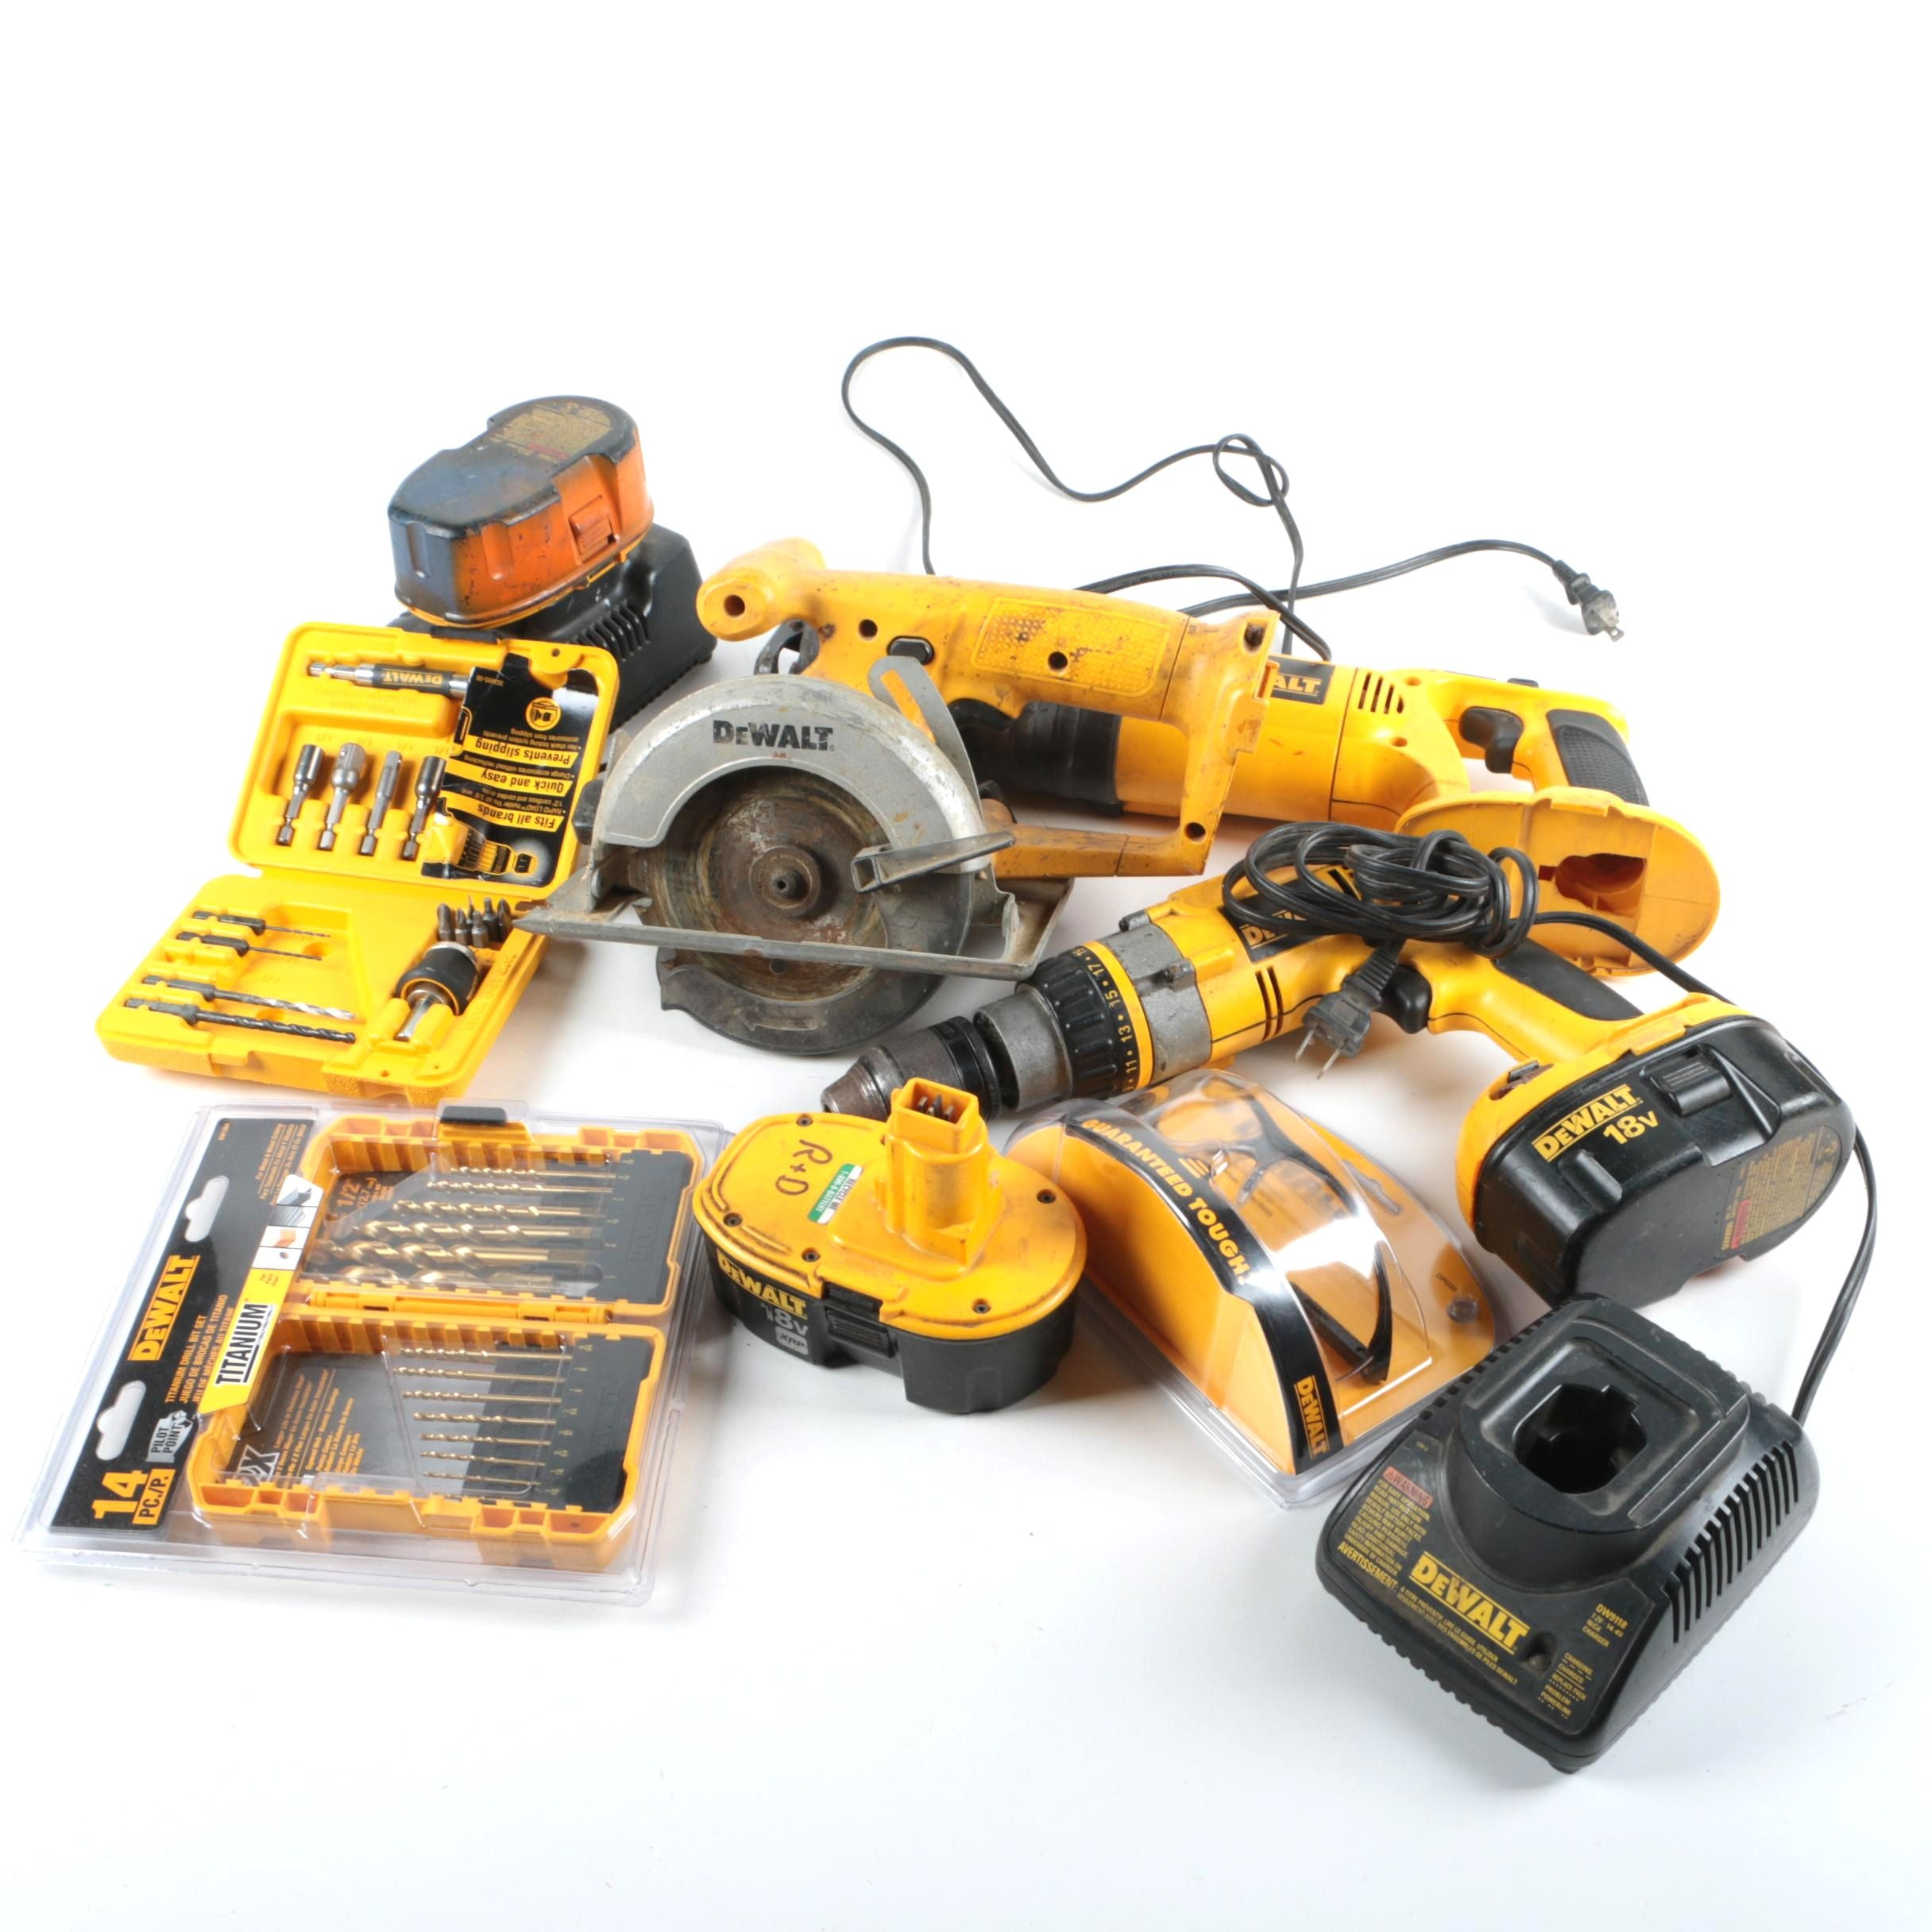 DeWalt Cordless Tools Including Circular Saw, Reciprocating Saw, and Drill